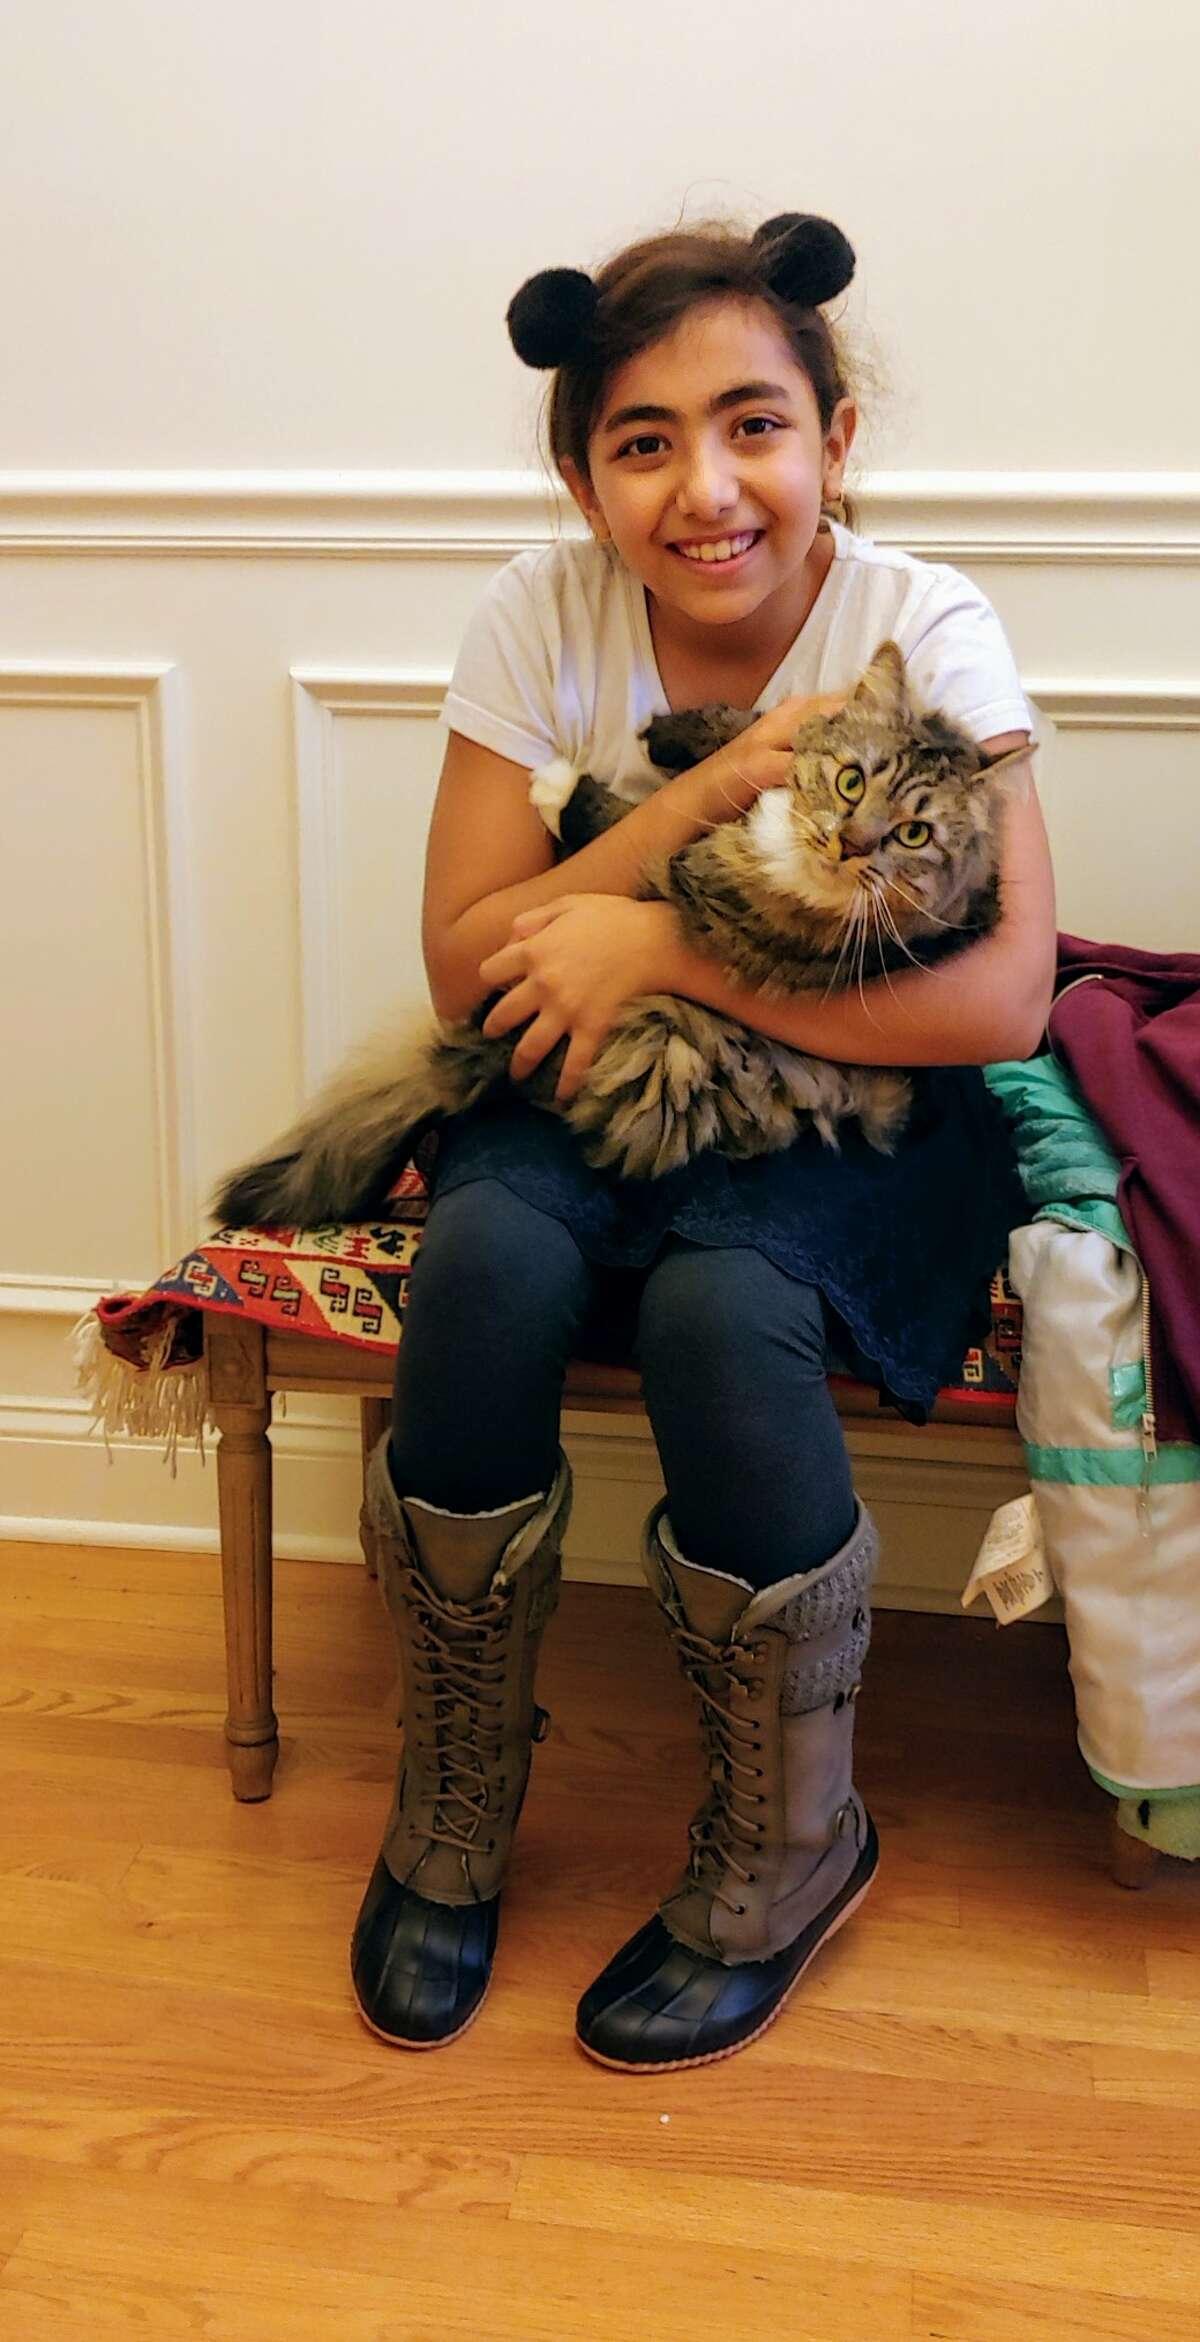 Ranna Payamfar with her beloved cat.